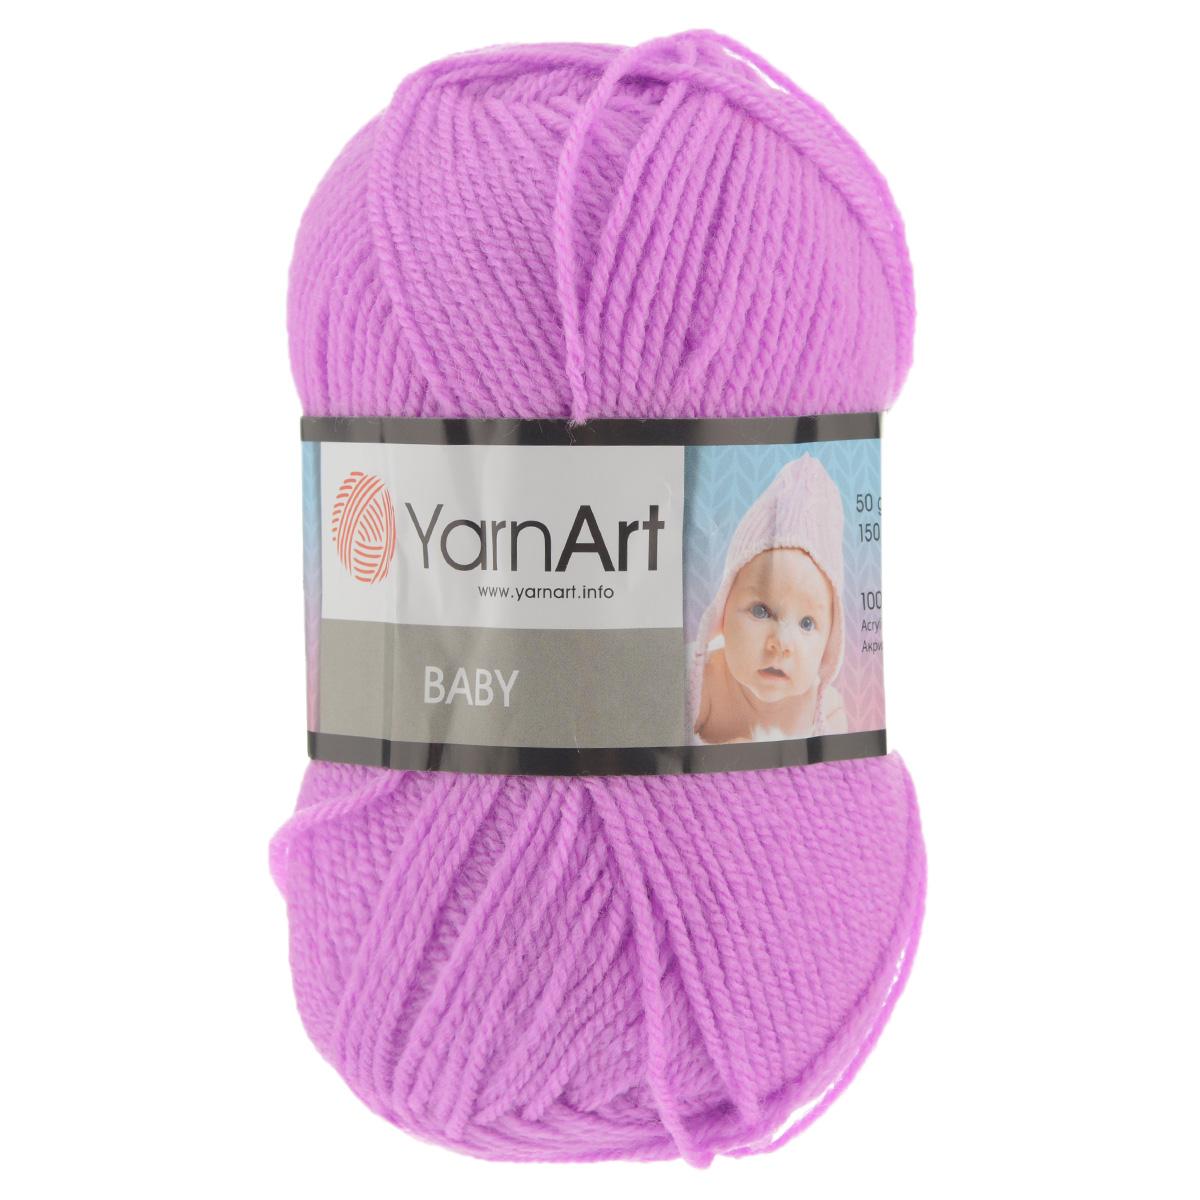 Пряжа для вязания YarnArt Baby, цвет: розовый (635), 150 м, 50 г, 5 шт пряжа для вязания yarnart baby color цвет белый черный 273 150 м 50 г 5 шт